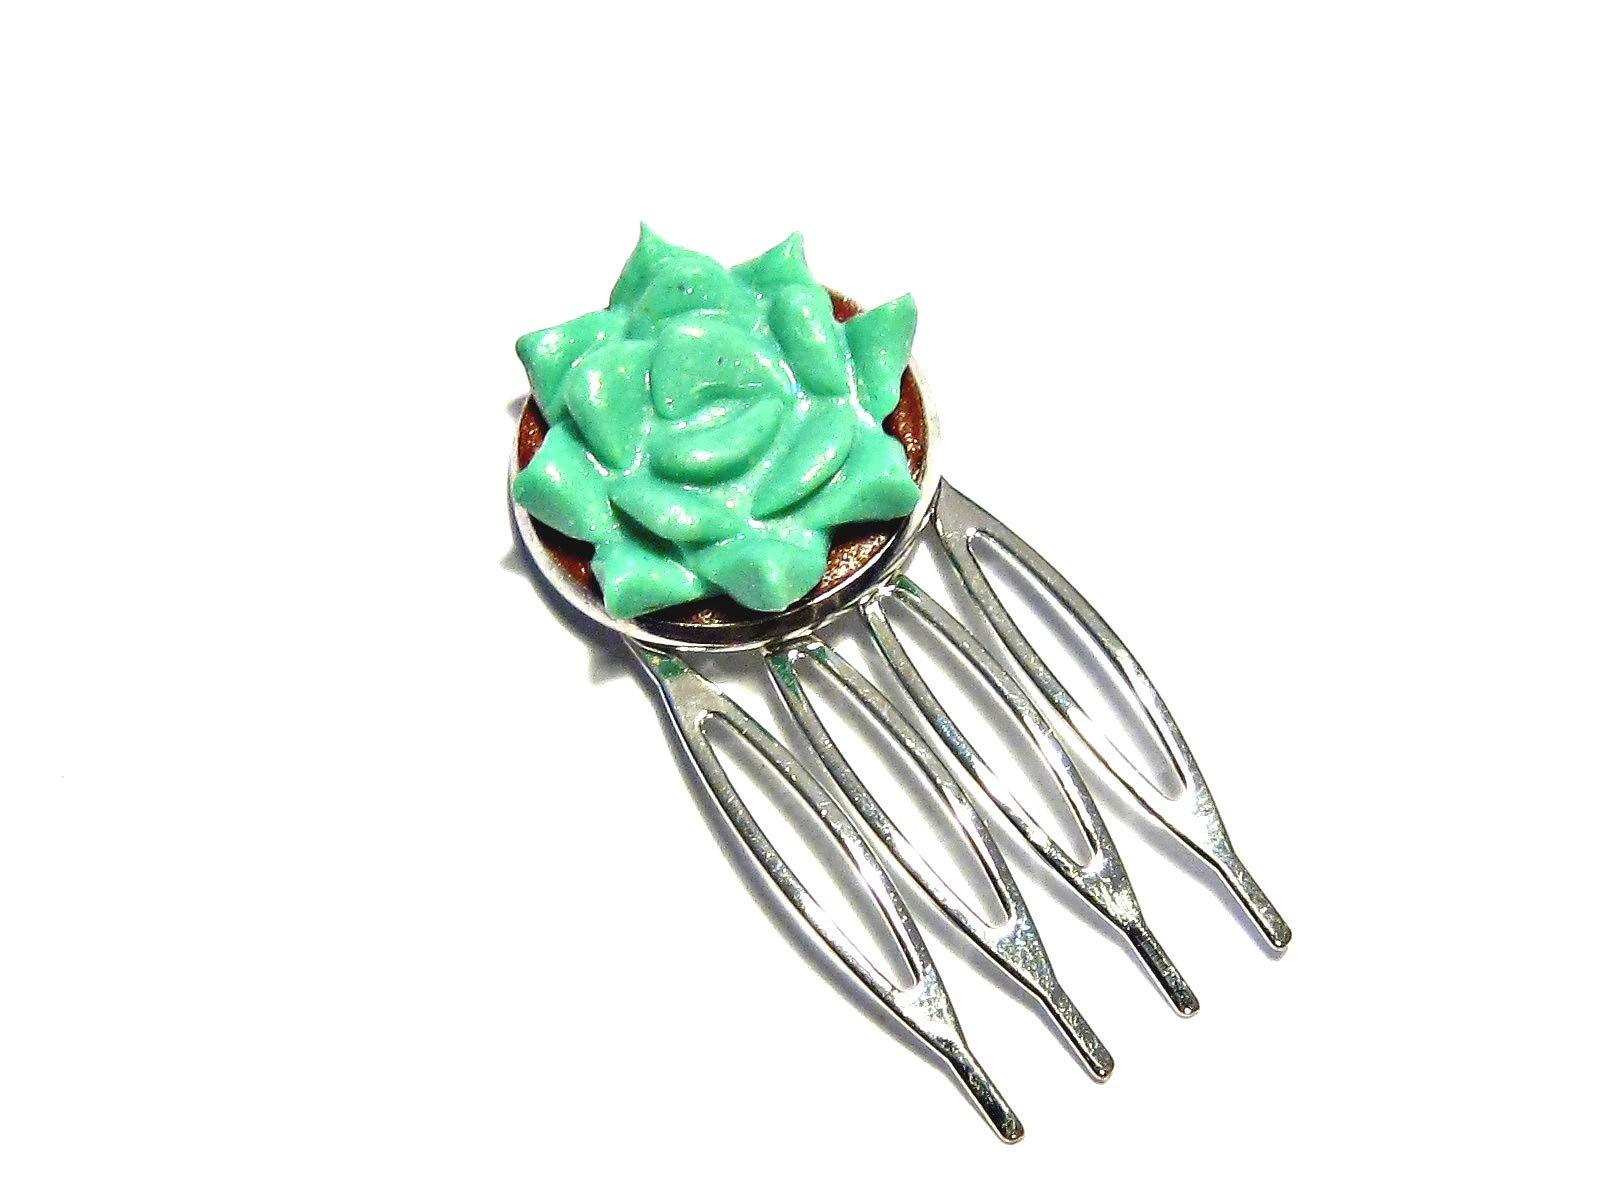 Succulent Comb - Turquoise - Tiny Food Jewelry